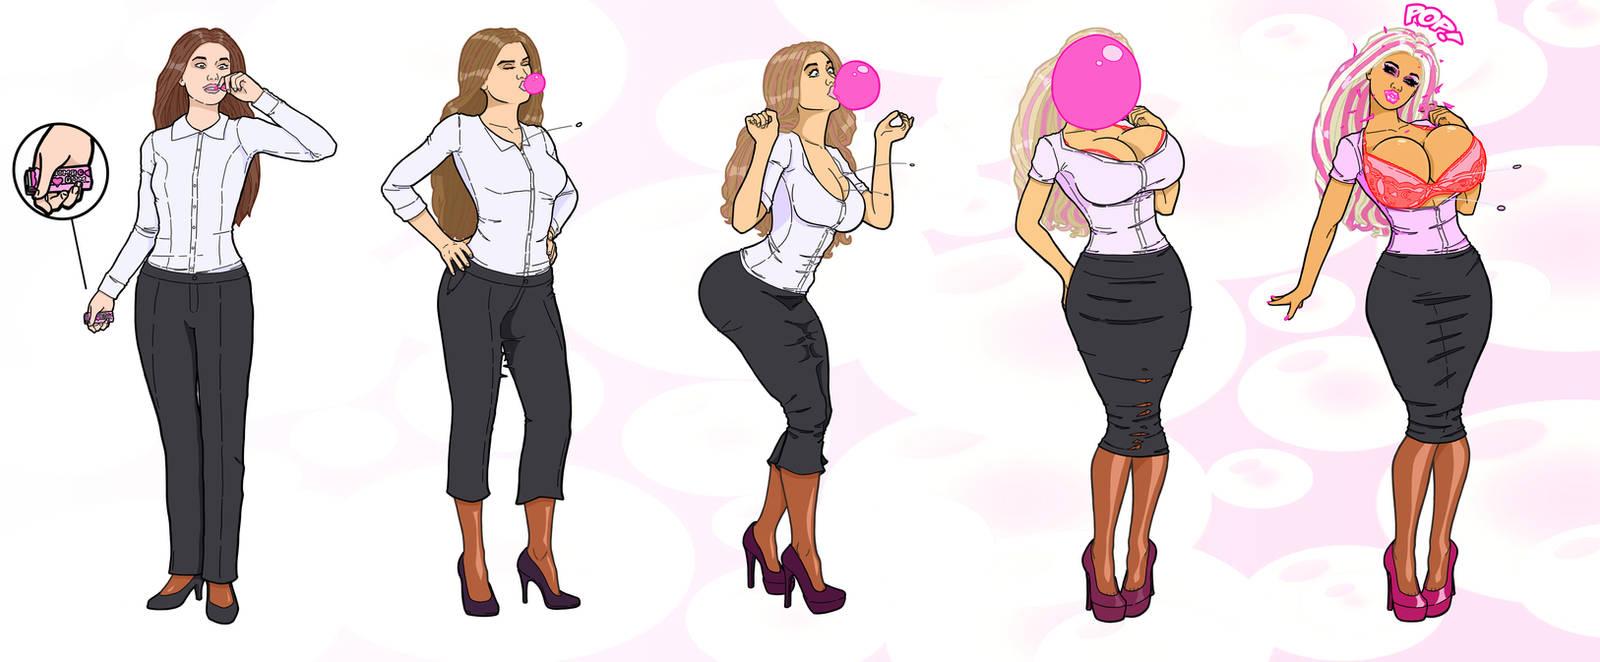 CMSN-Bubblegum Bimbo TF By Banedearg On DeviantArt